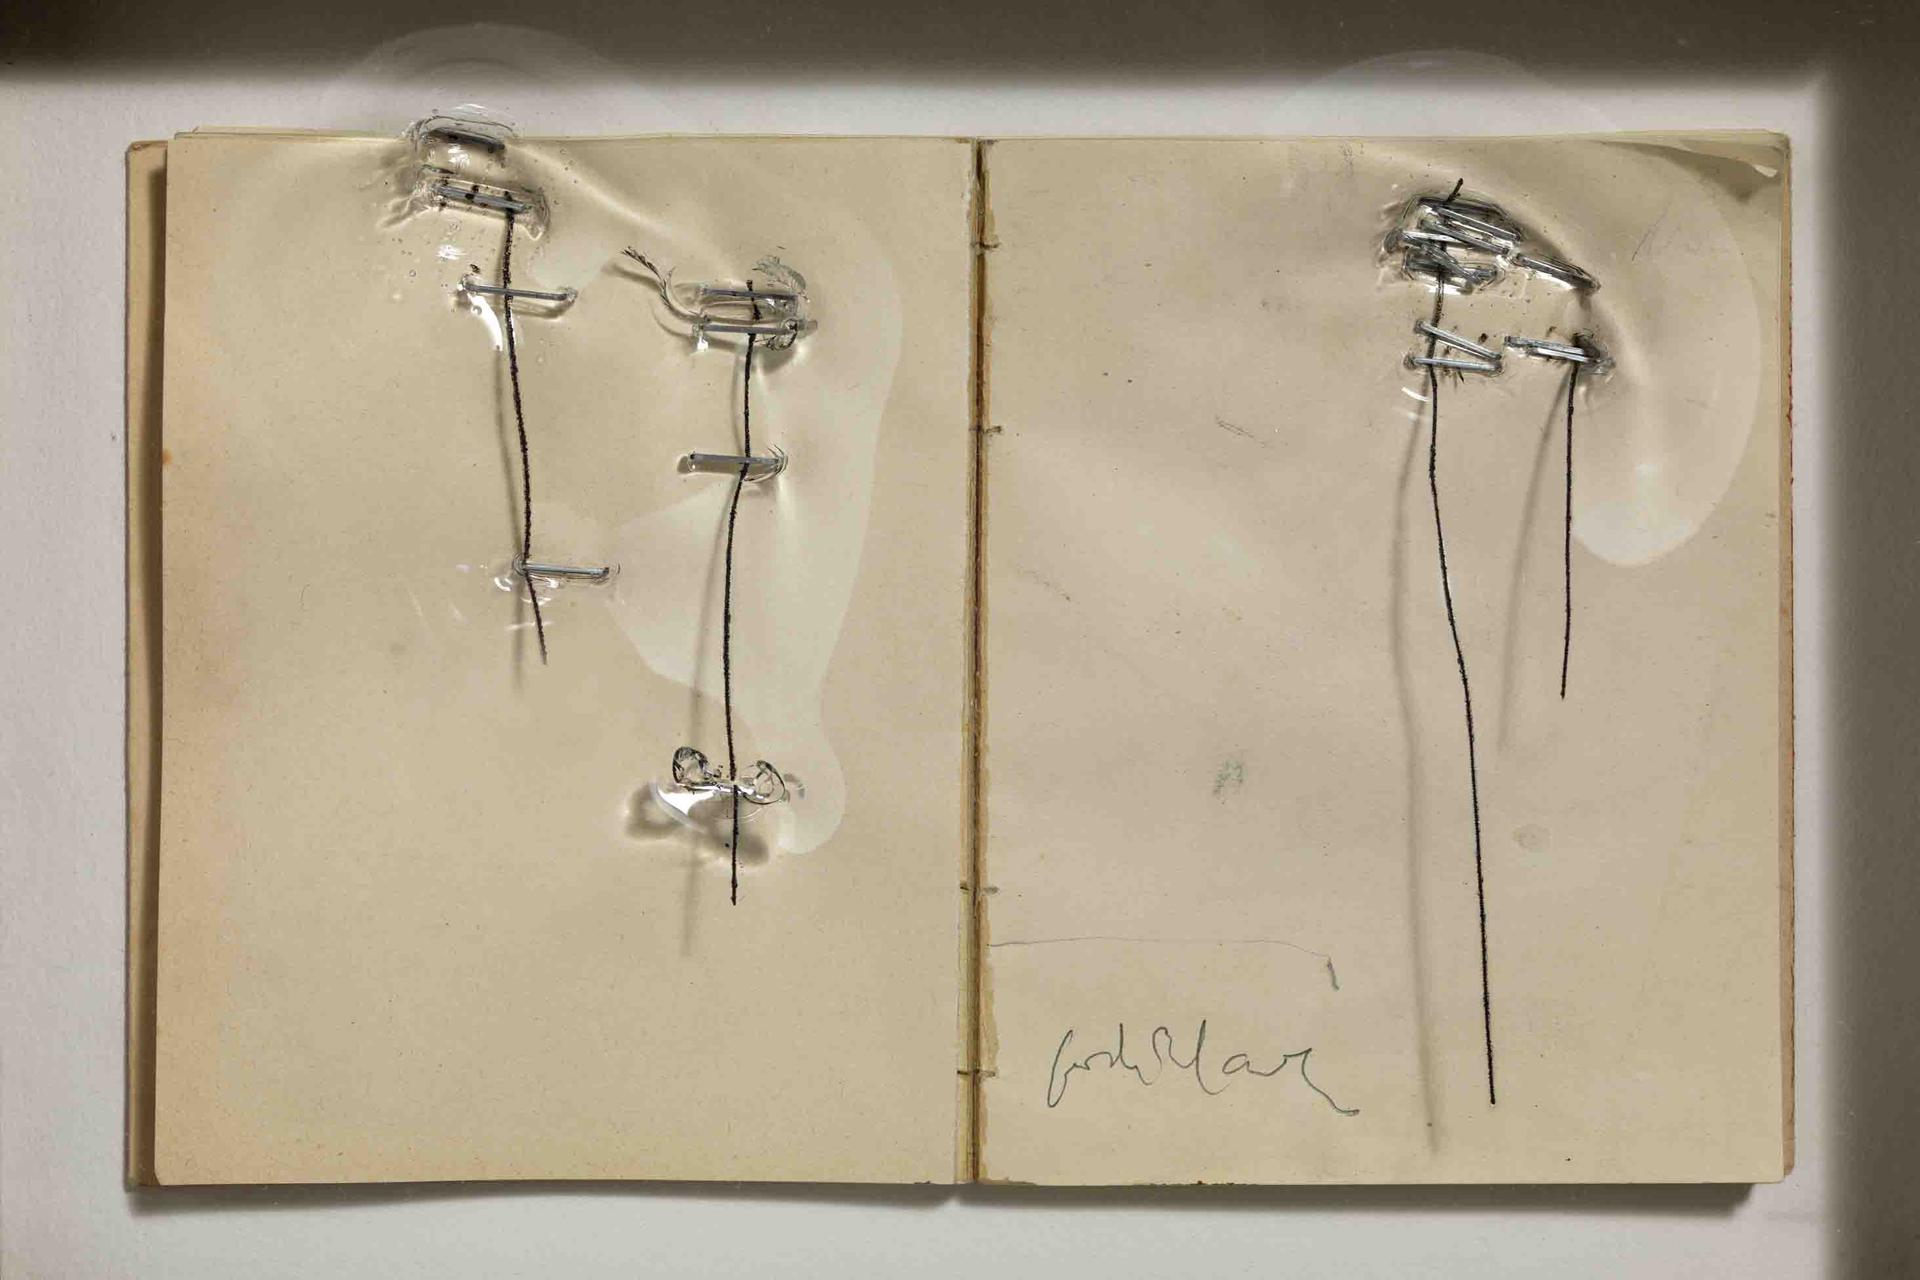 Jordi Alcaraz, Sense titol / Untitled, 2011, aufgeschlagenes Buch, Drahtklammern, Kaltnadel und Methacrylat, 33 x 38 x 7 cm